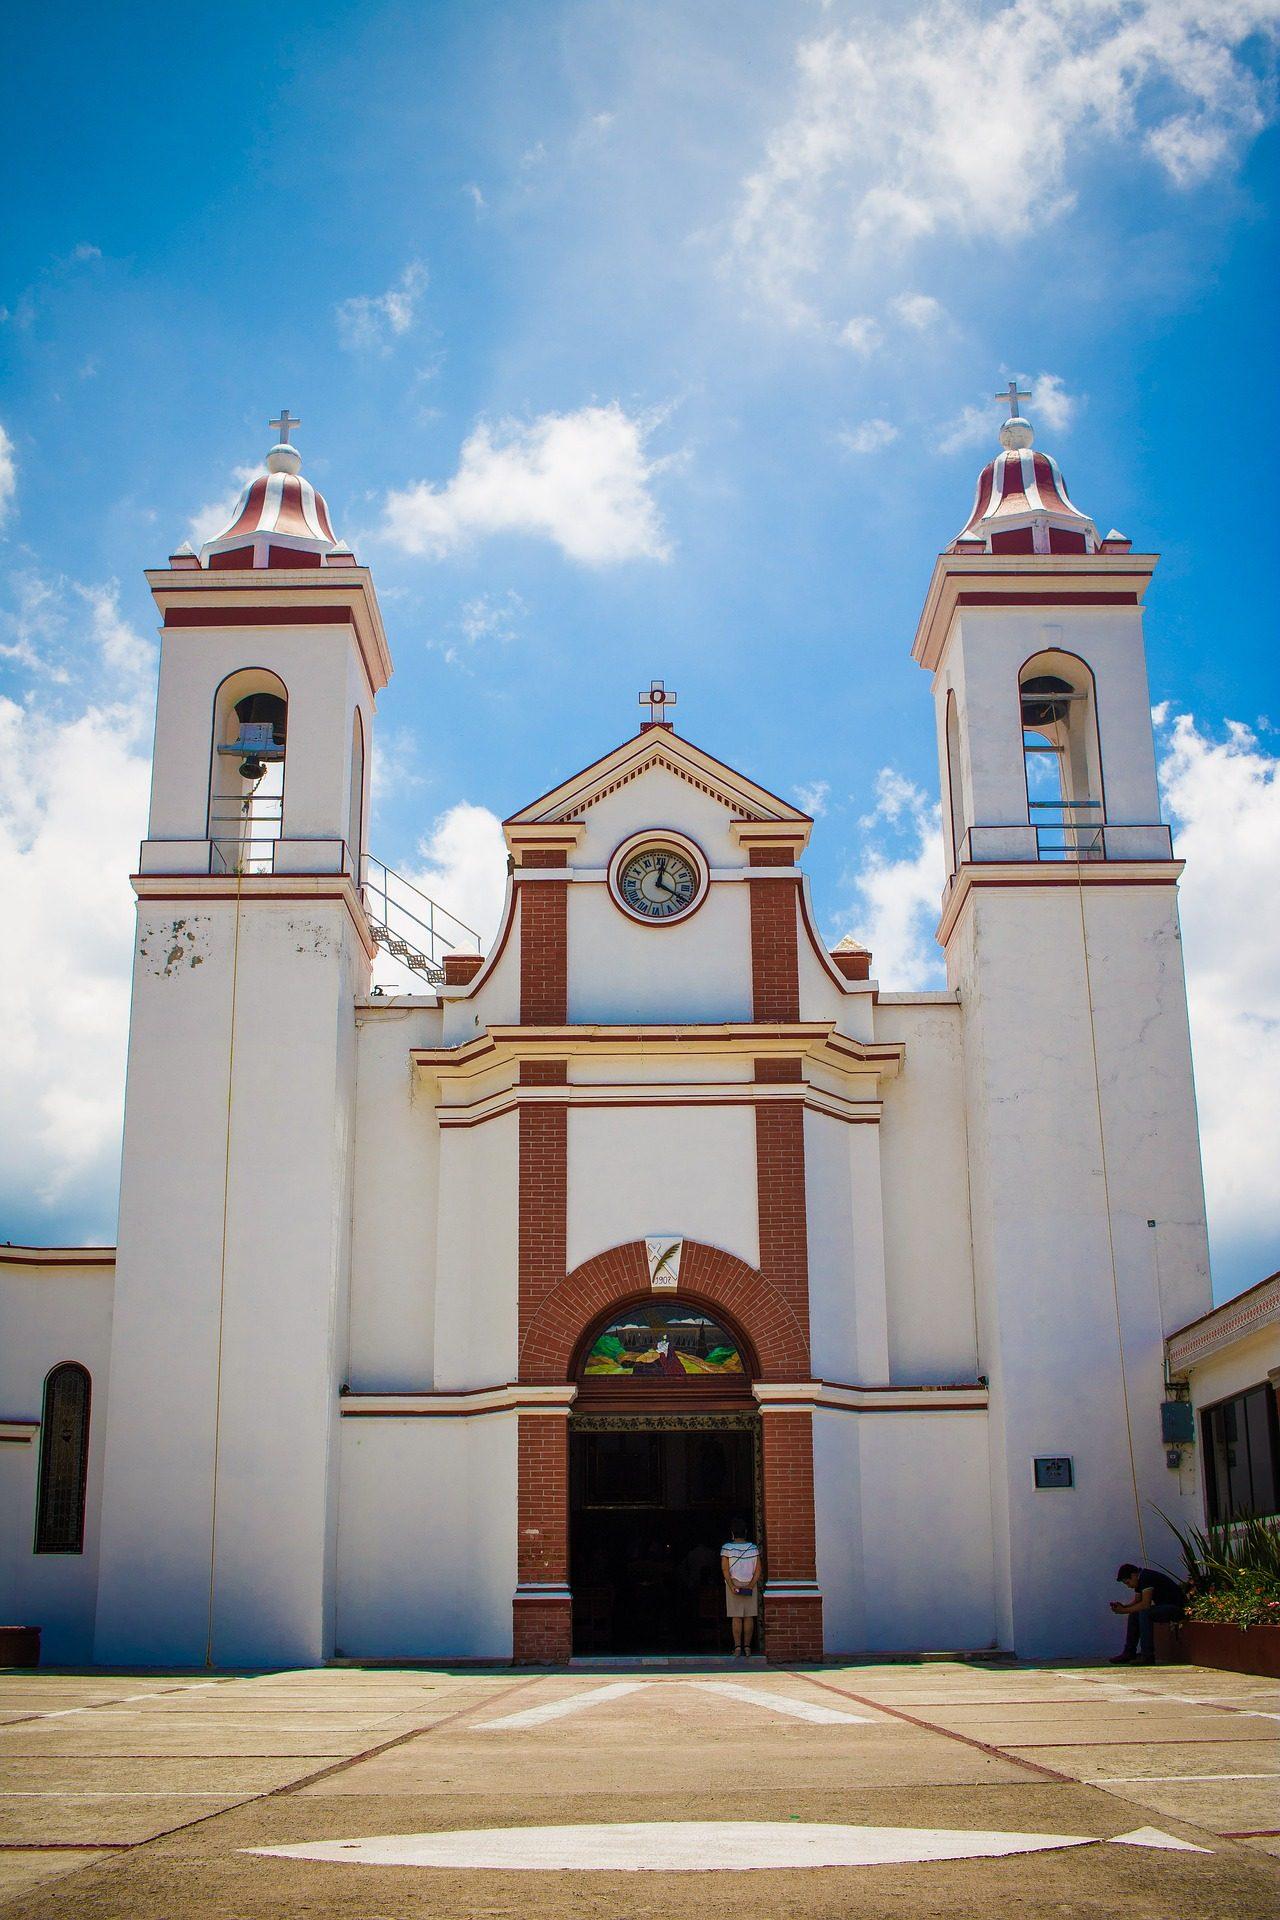 Église, Temple, bâtiment, Torres, campagnes, Sky - Fonds d'écran HD - Professor-falken.com